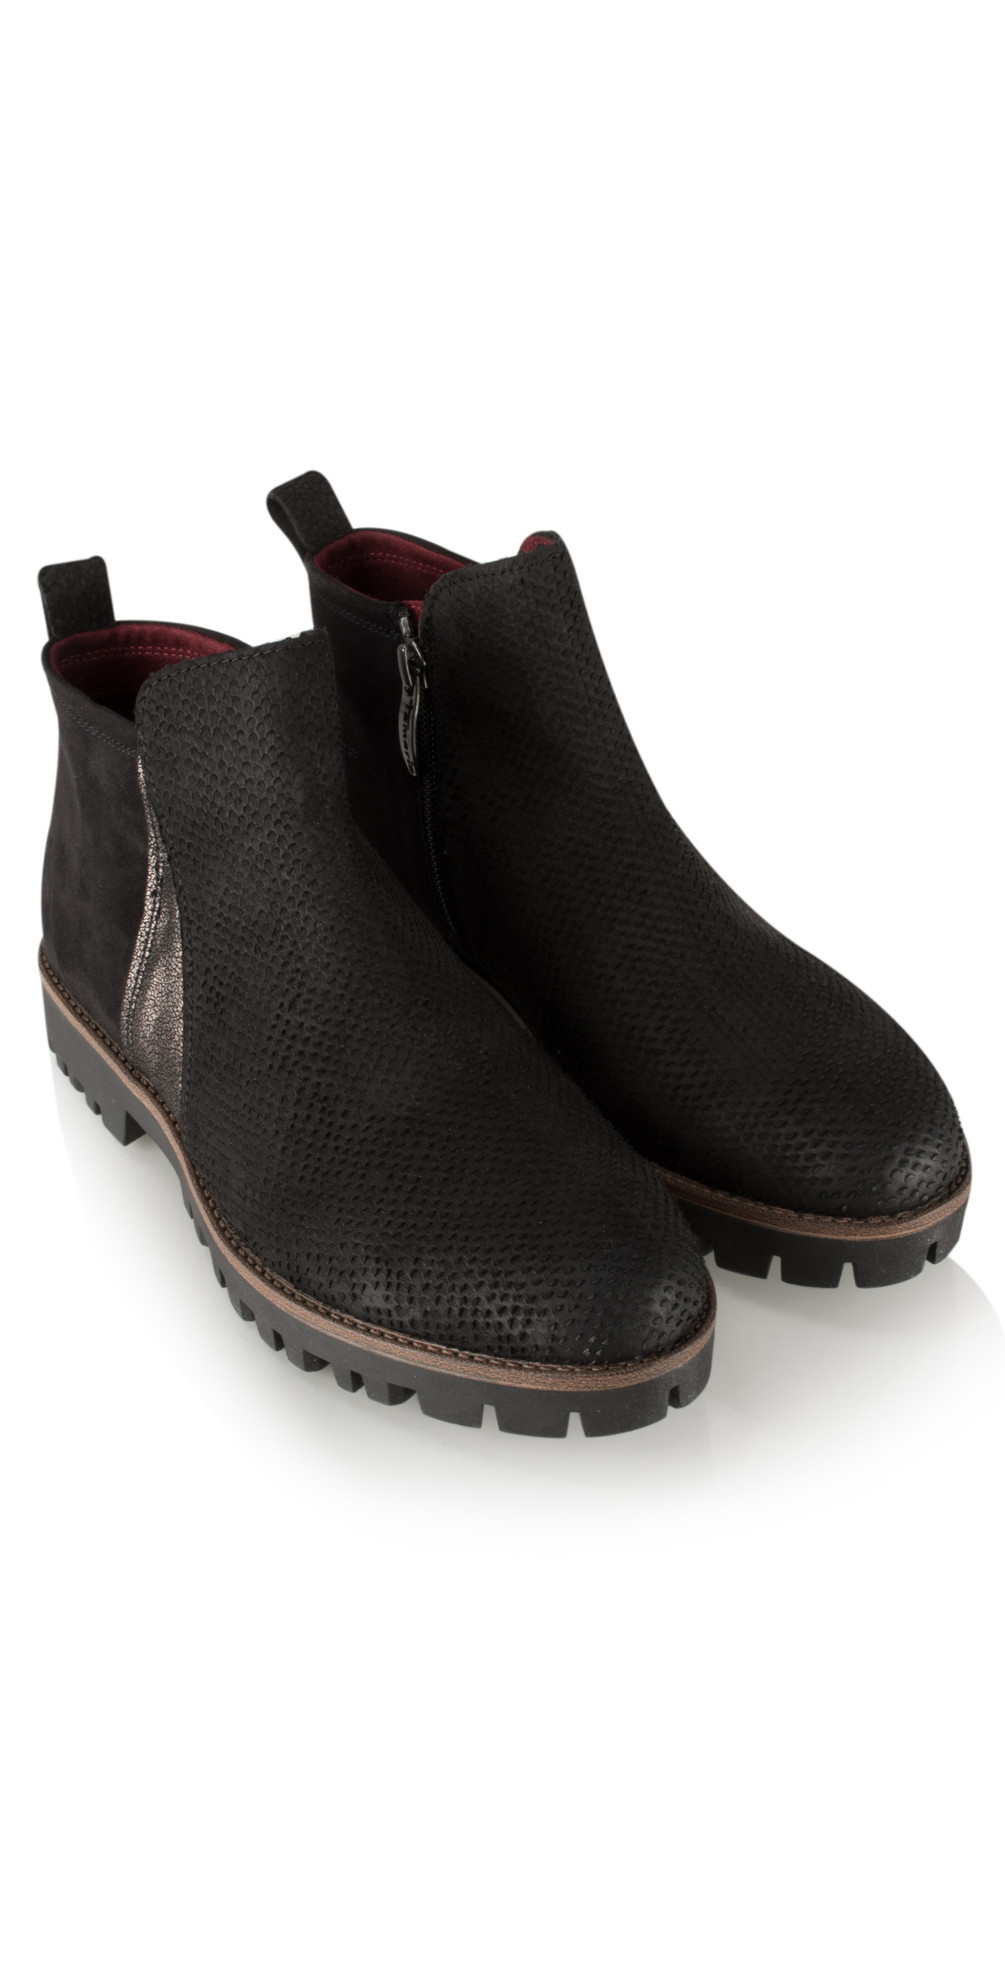 tamaris urban textured suede chelsea boot in black. Black Bedroom Furniture Sets. Home Design Ideas